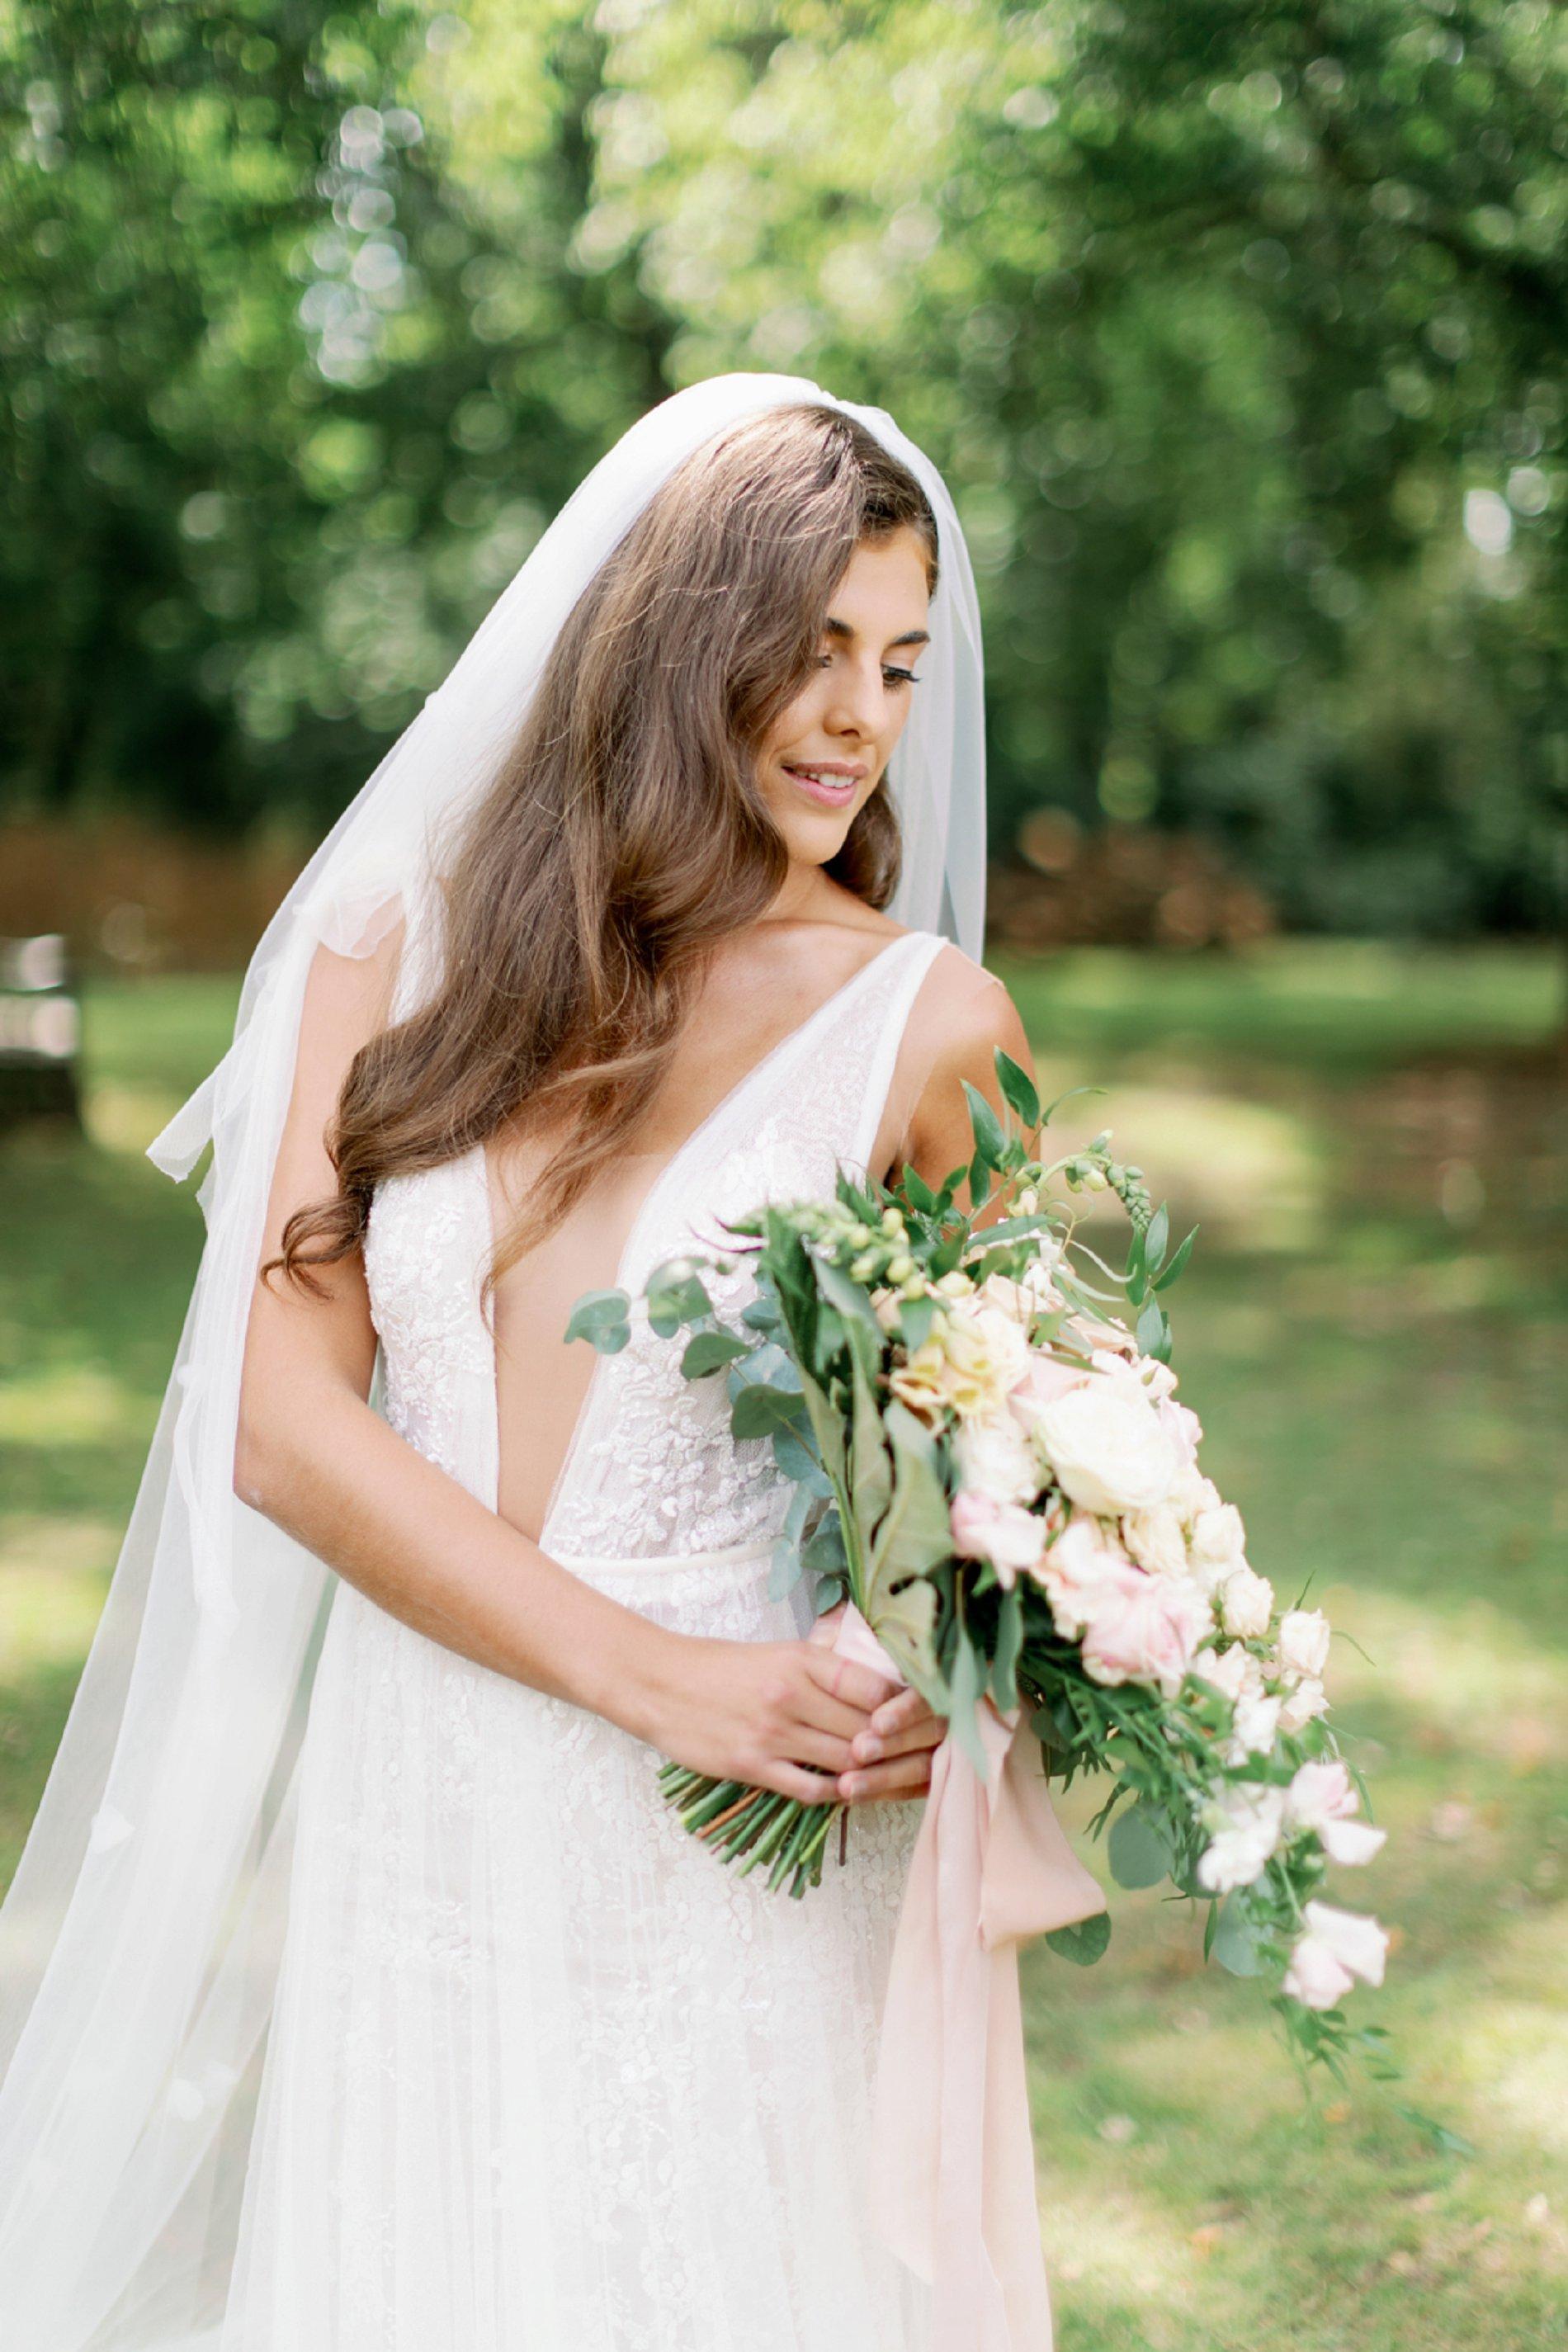 An Elegant Styled Shoot at Baddow Park House (c) Camilla J Hards (22)